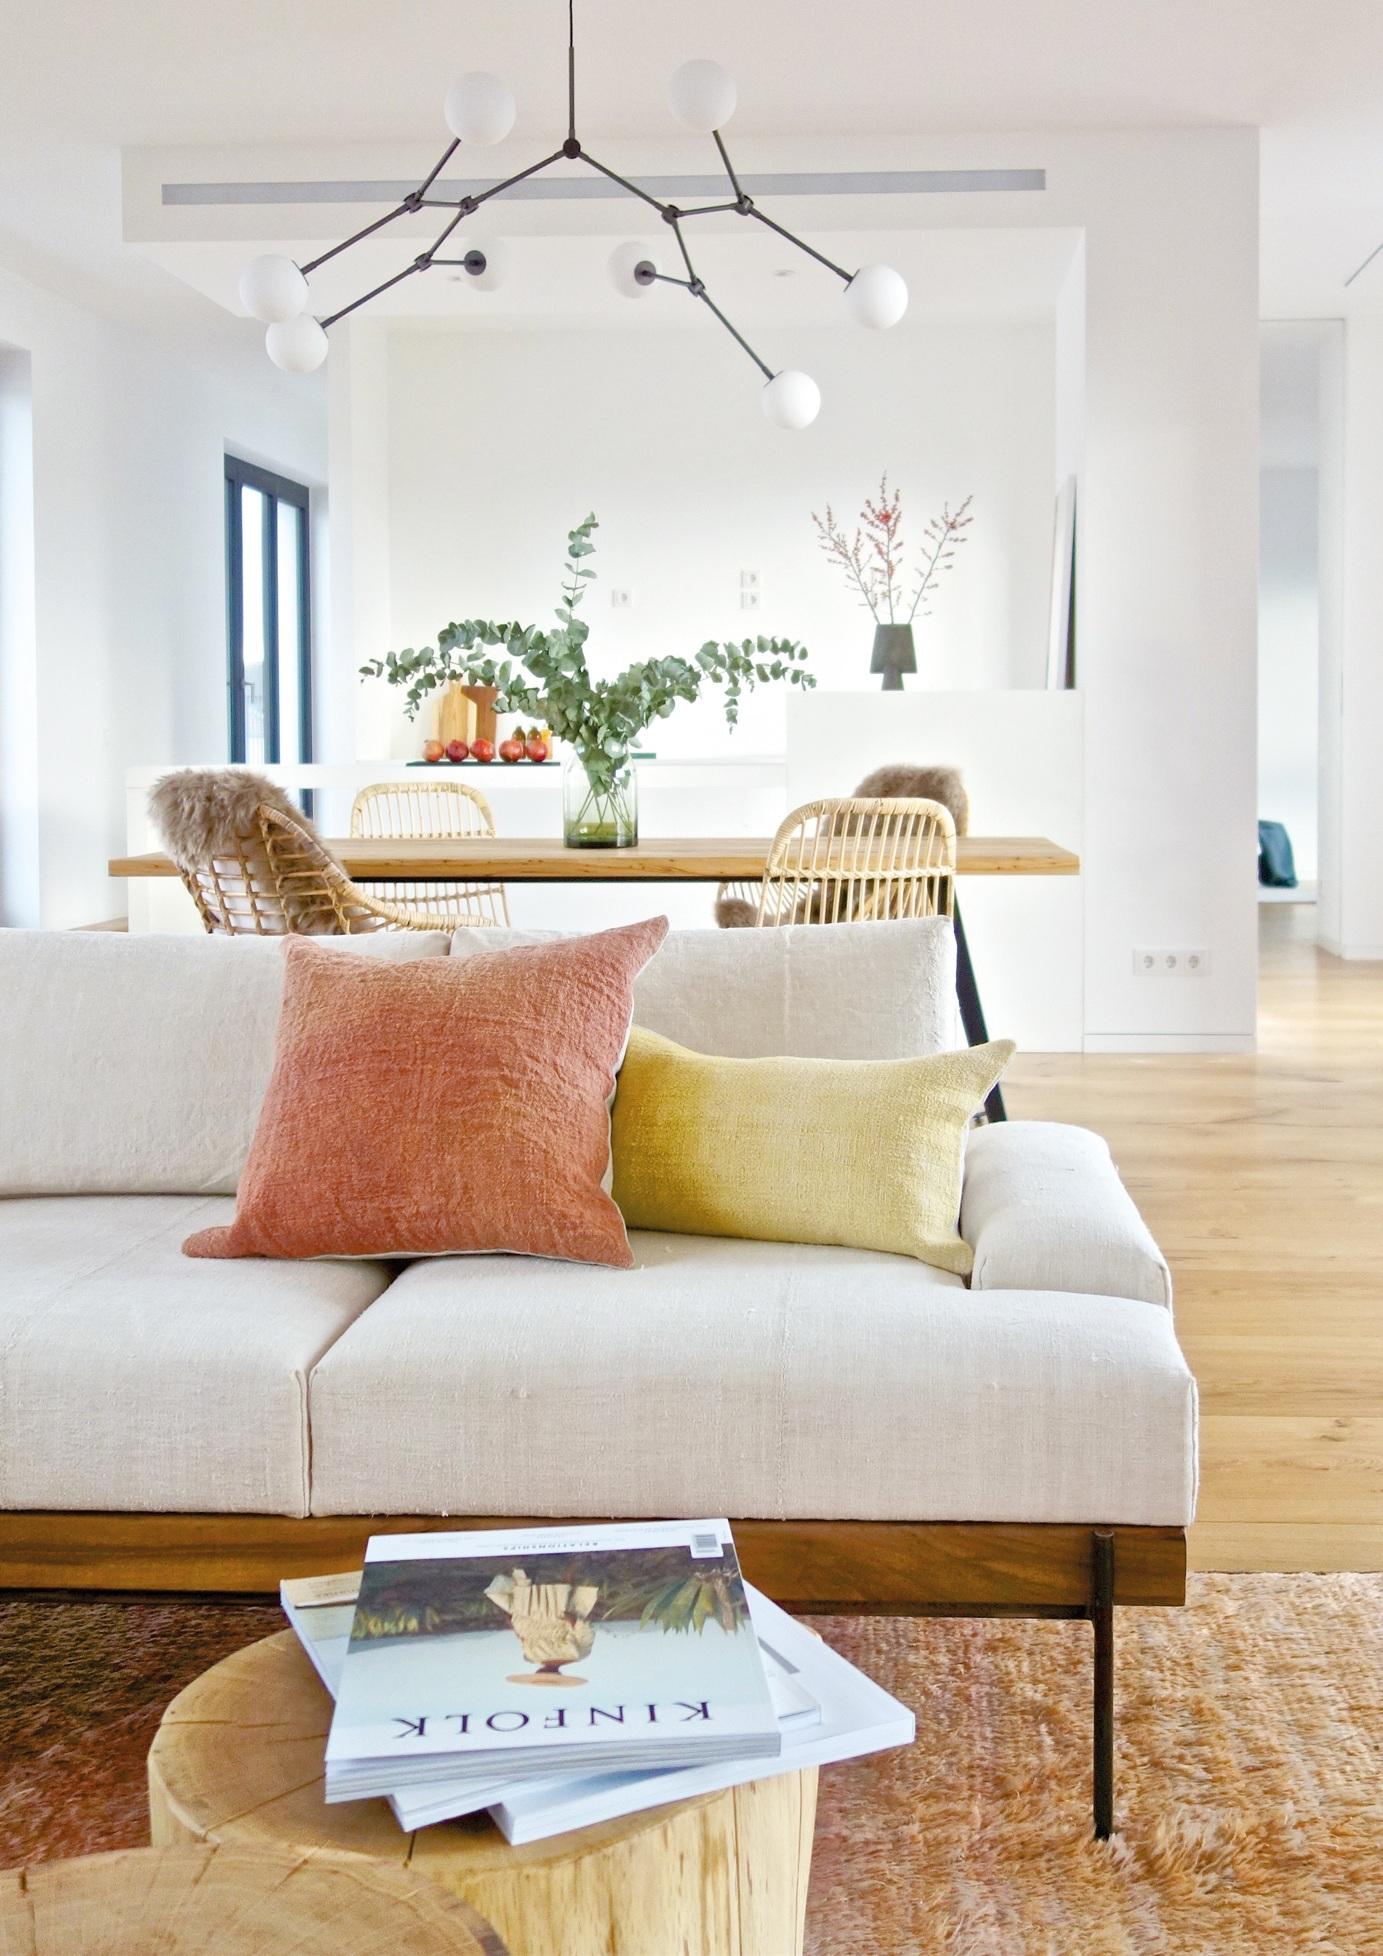 espanyolet_Couch.jpg